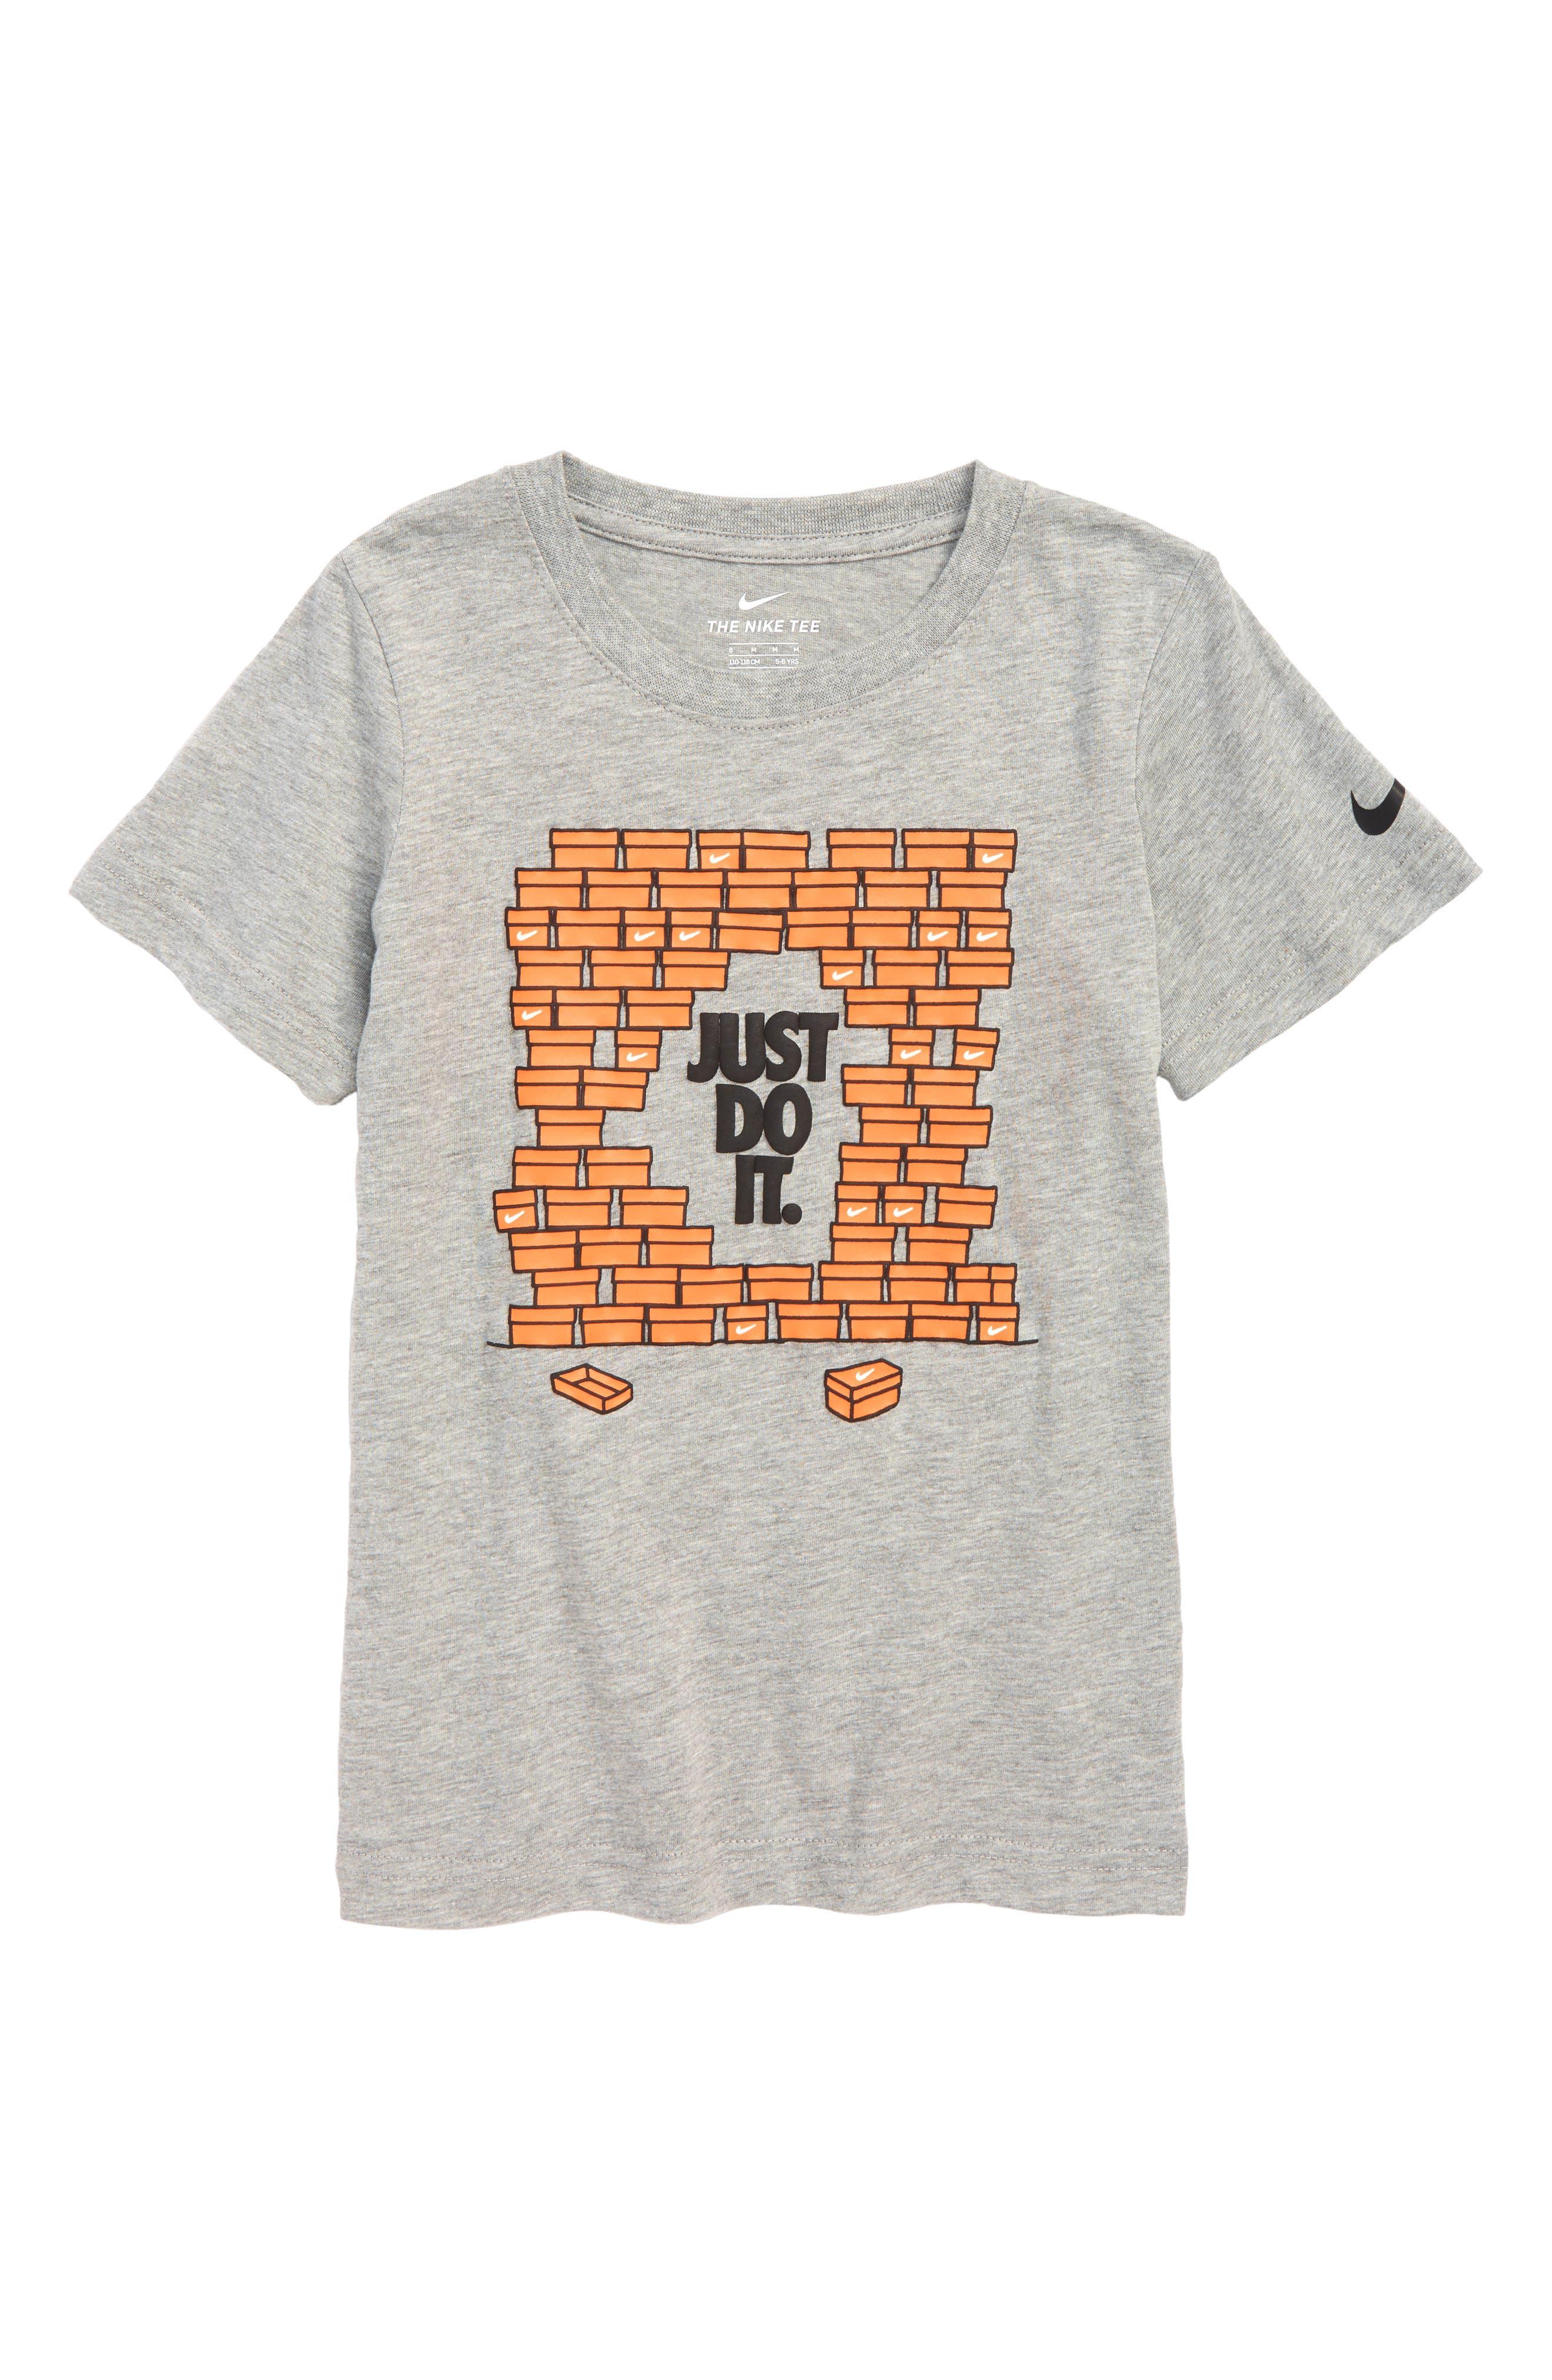 Shoebox Just Do It T-Shirt,                             Main thumbnail 1, color,                             DARK GREY HEATHER